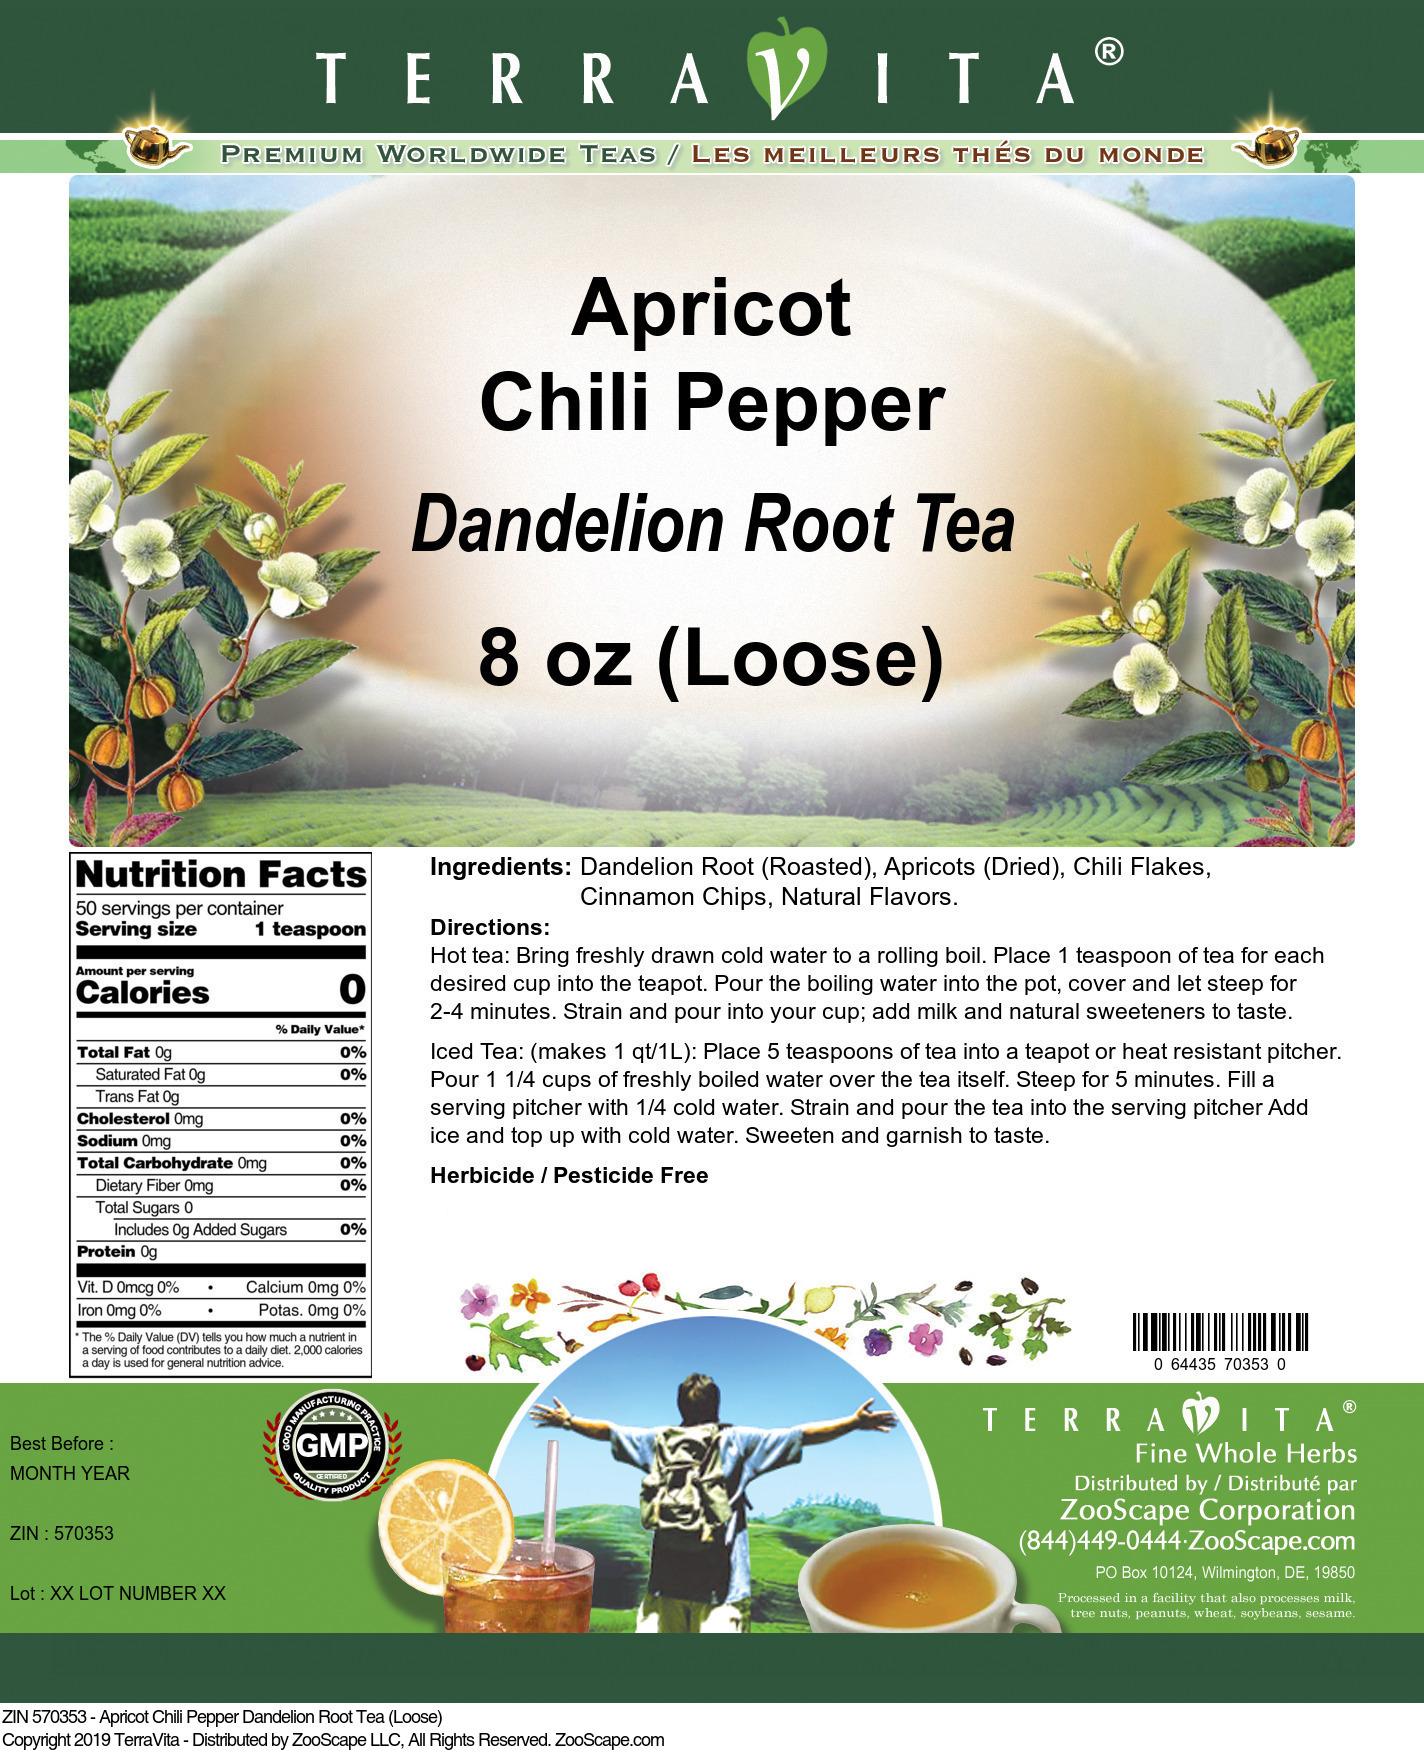 Apricot Chili Pepper Dandelion Root Tea (Loose)